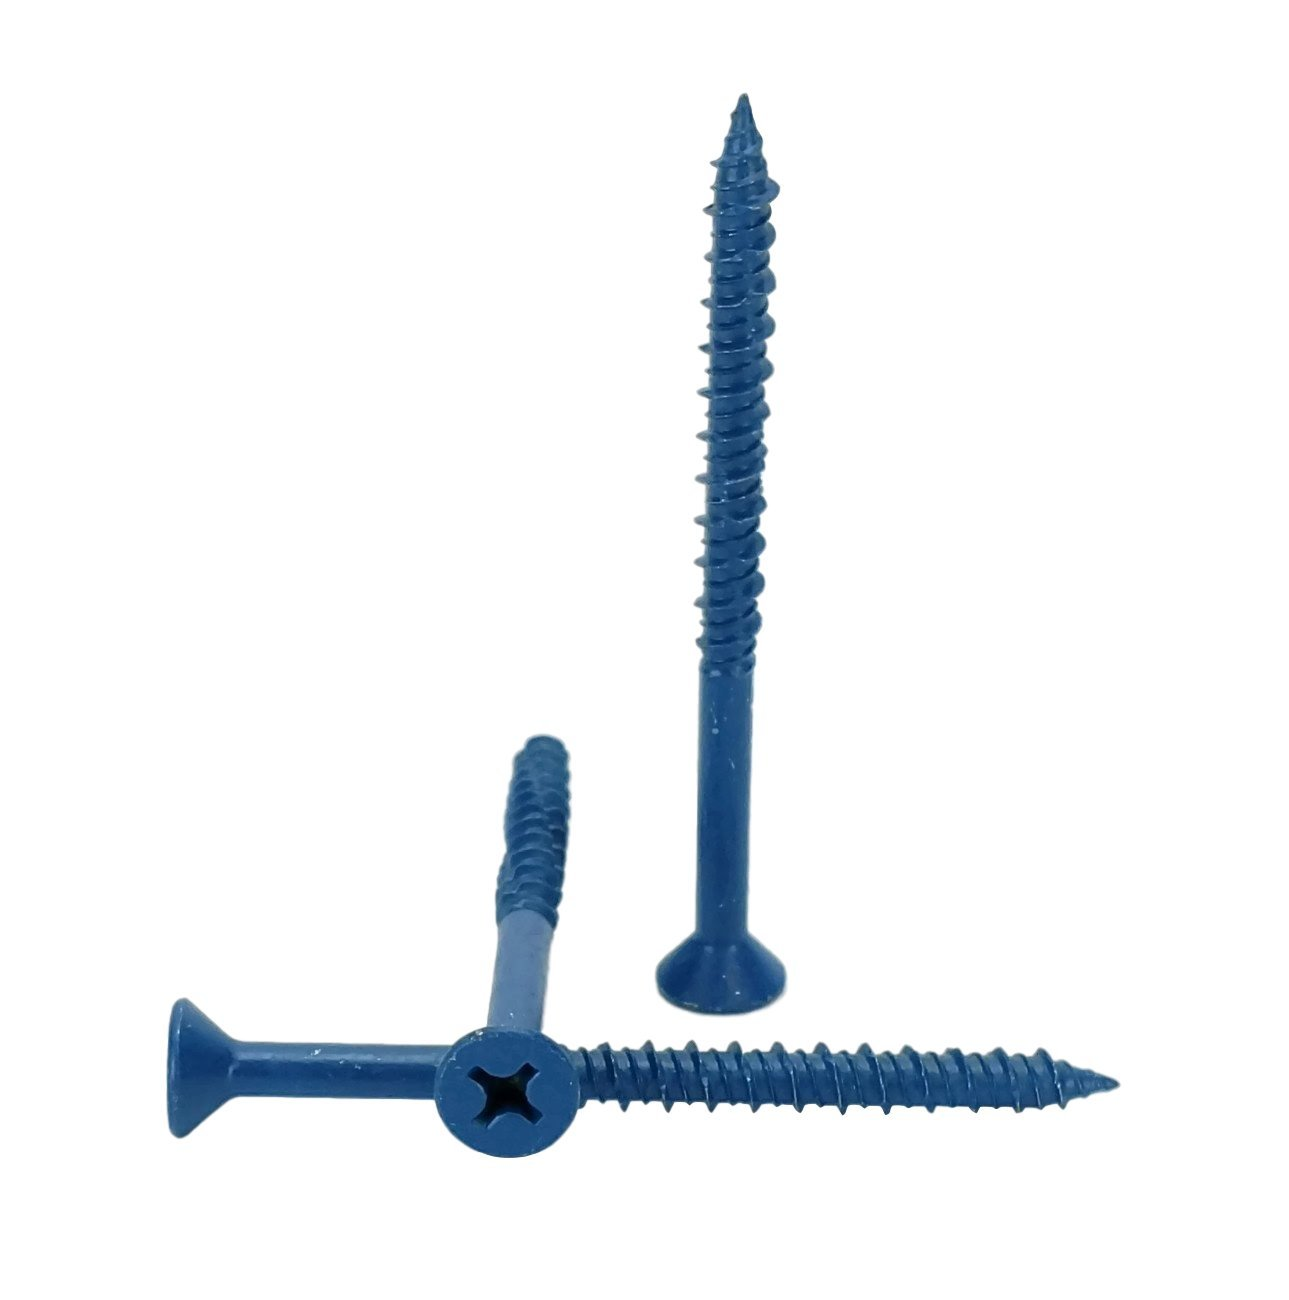 Chenango Supply 1/4 x 3-1/4'' Flat Head Concrete Screw Anchor. 100 pieces With Drill Bit(Miami-Dade Compliant) (1/4 x 3-1/4) by Chenango Supply